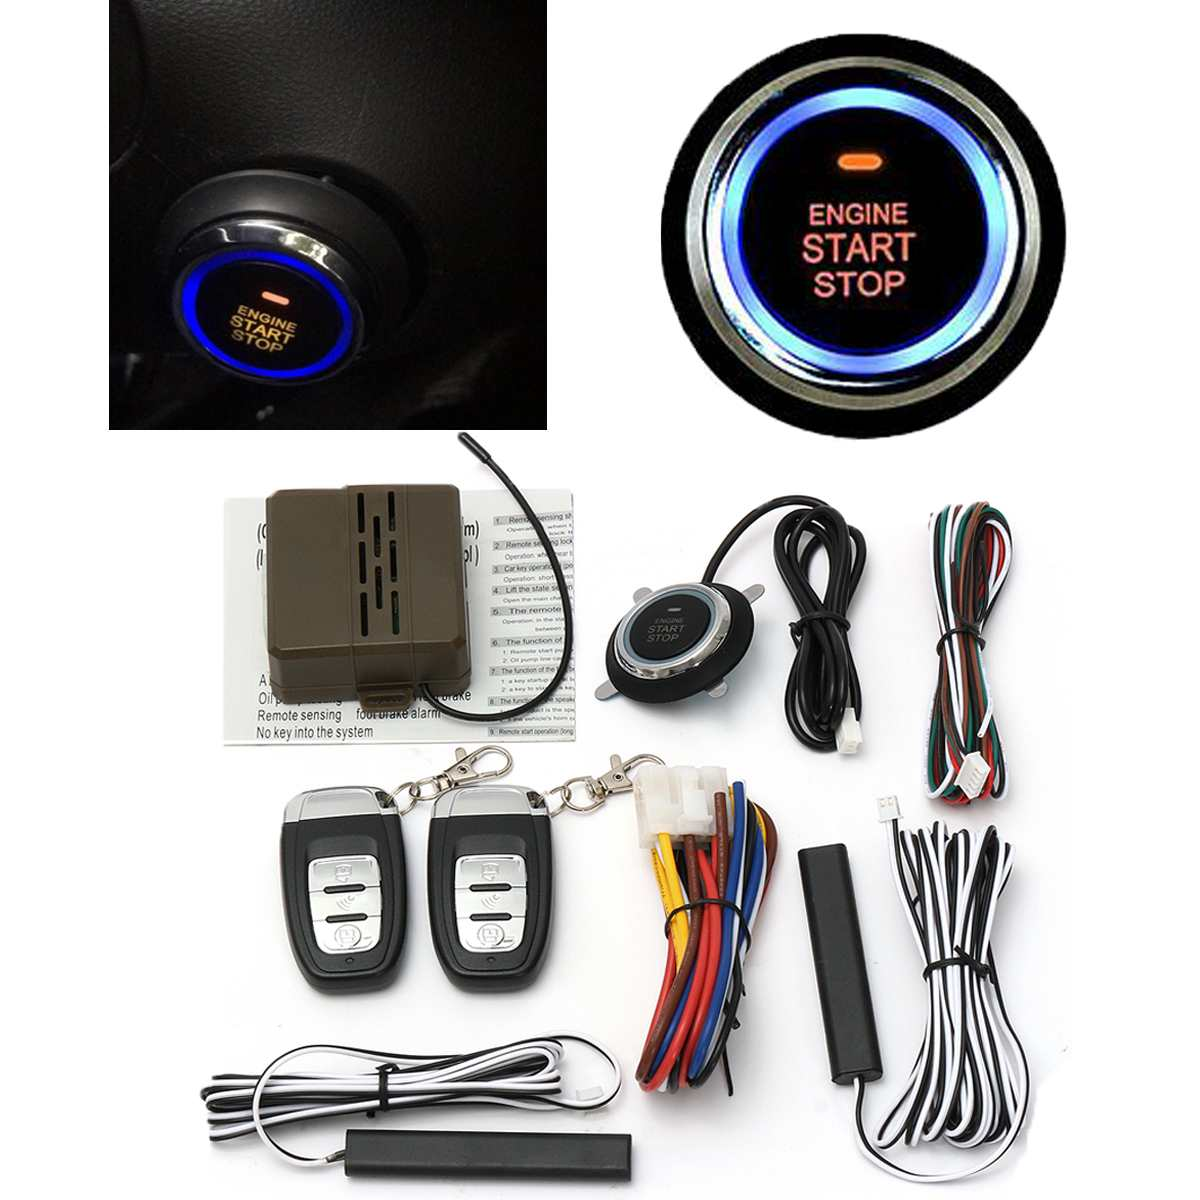 Audew Car Engine Start Stop SUV Keyless Entry Engine Start Alarm System Push Button Remote Starter Stop Auto Car Accessories